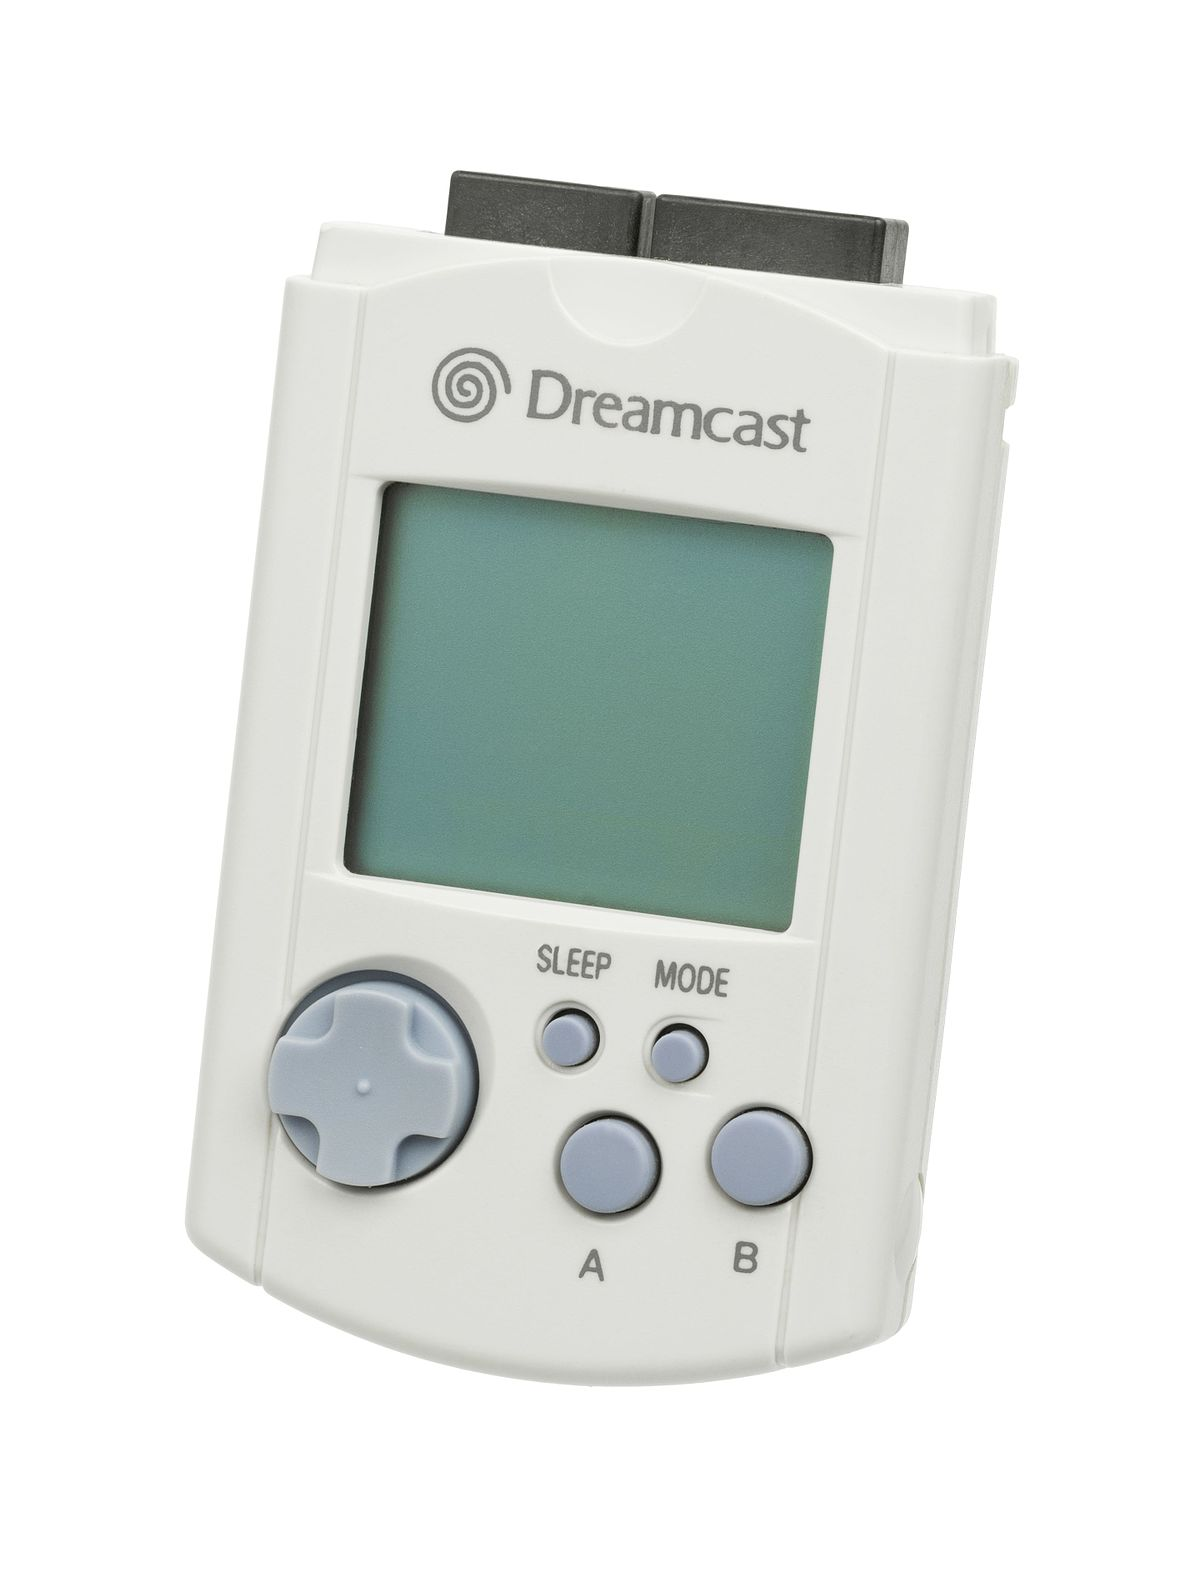 accesorio dreamcast